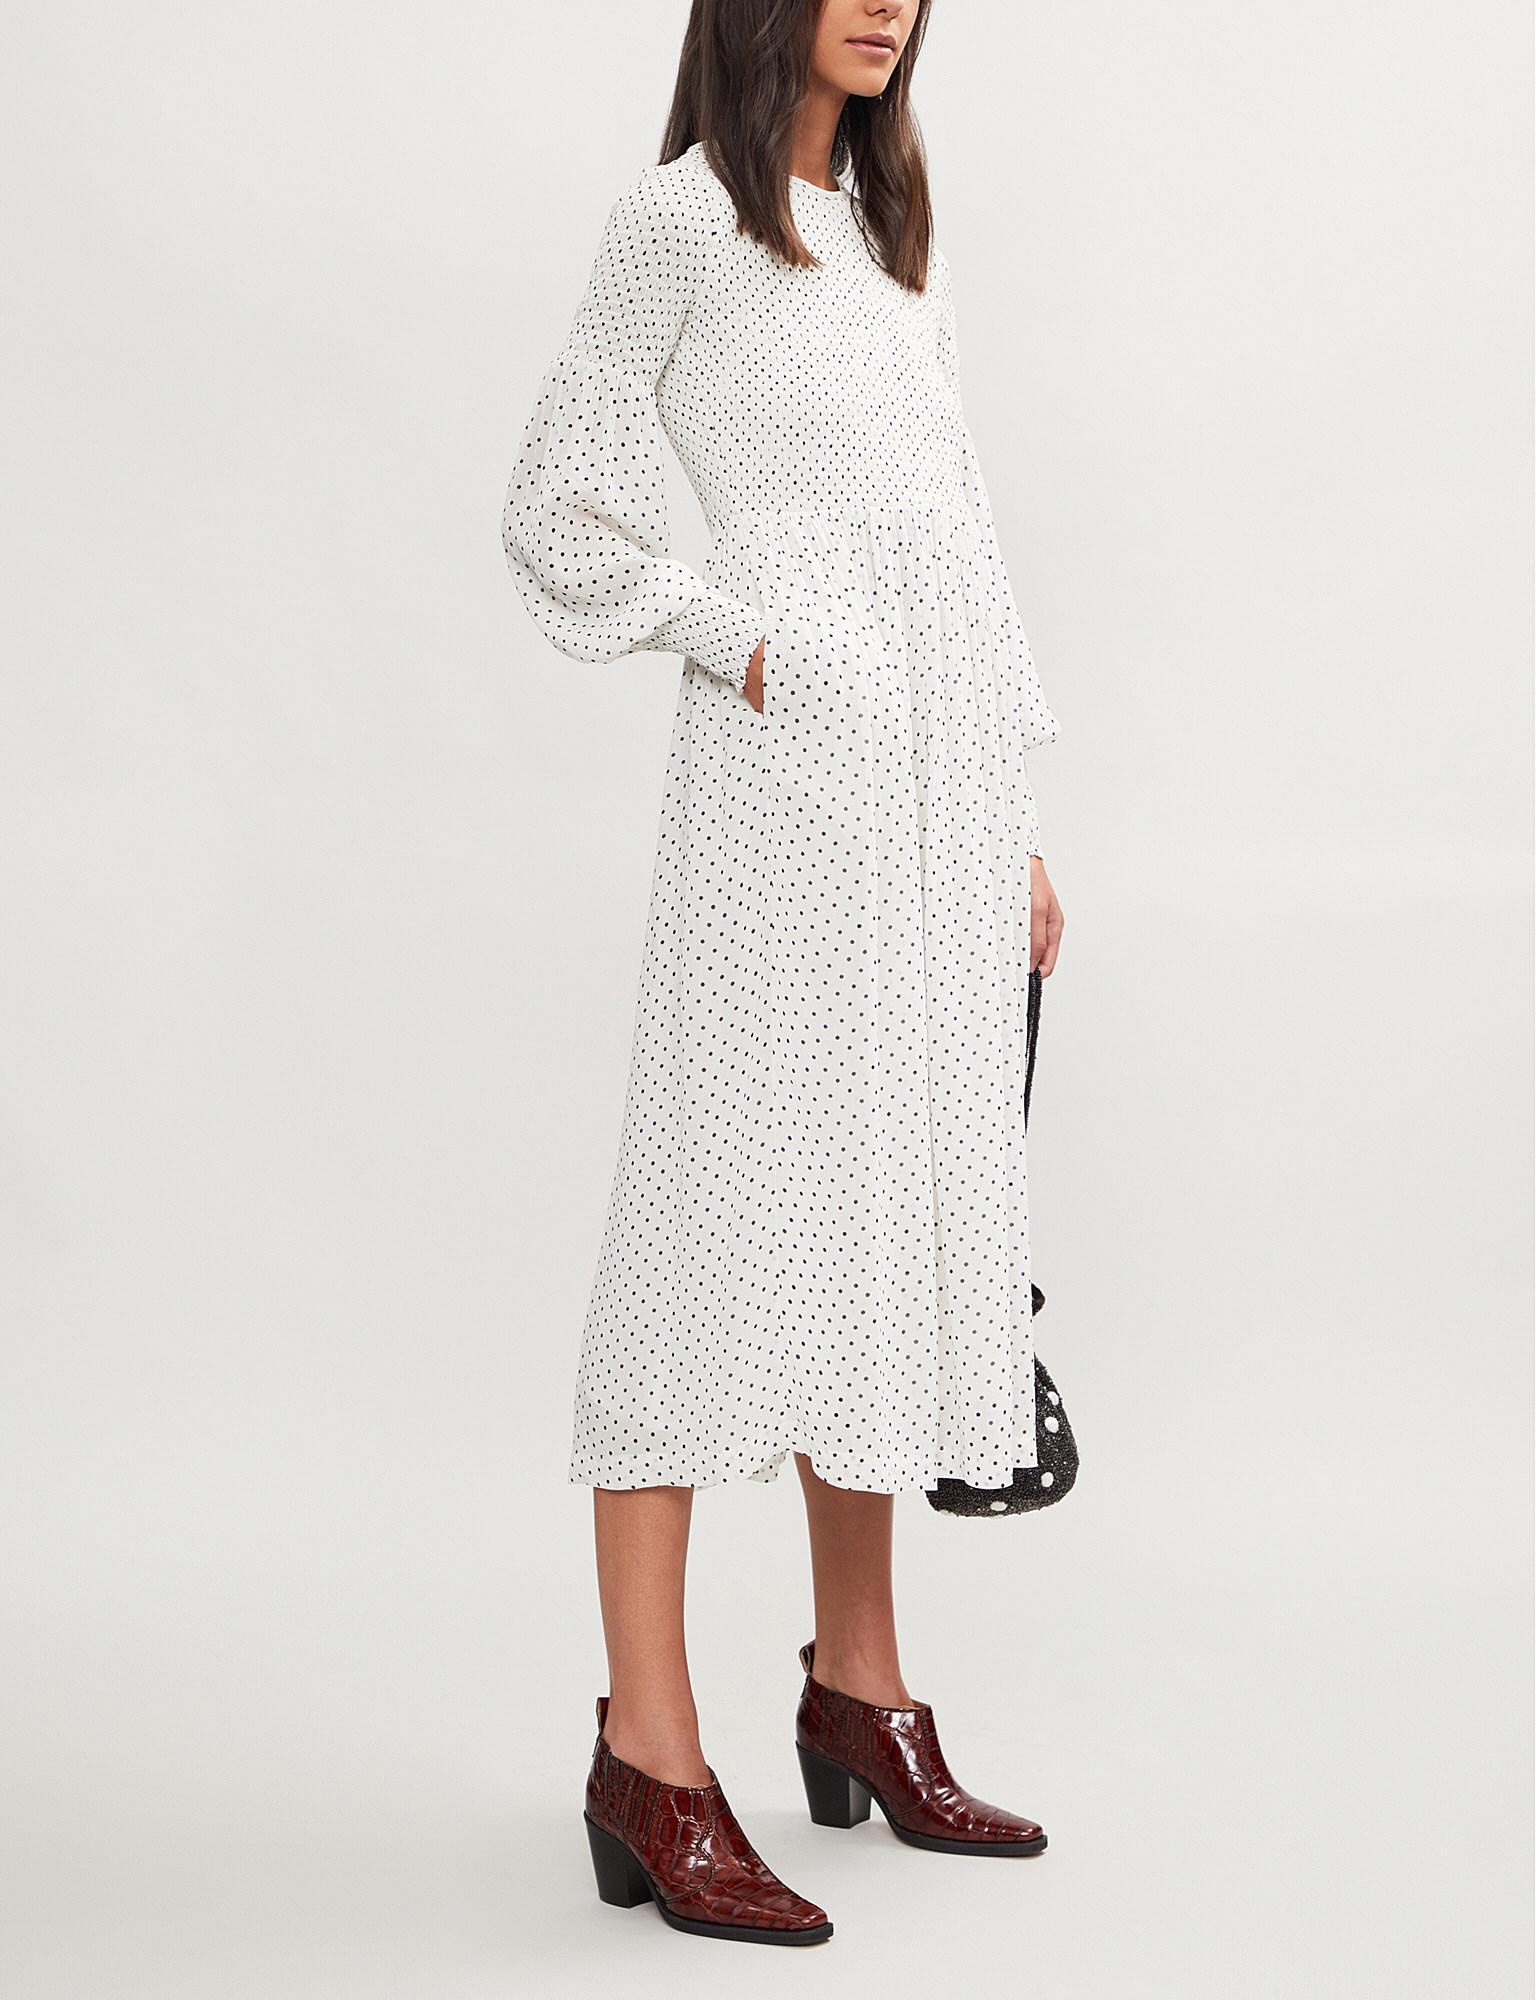 0cbf0266 Ganni Rometty Polka-dot Crepe Midi Dress in White - Lyst